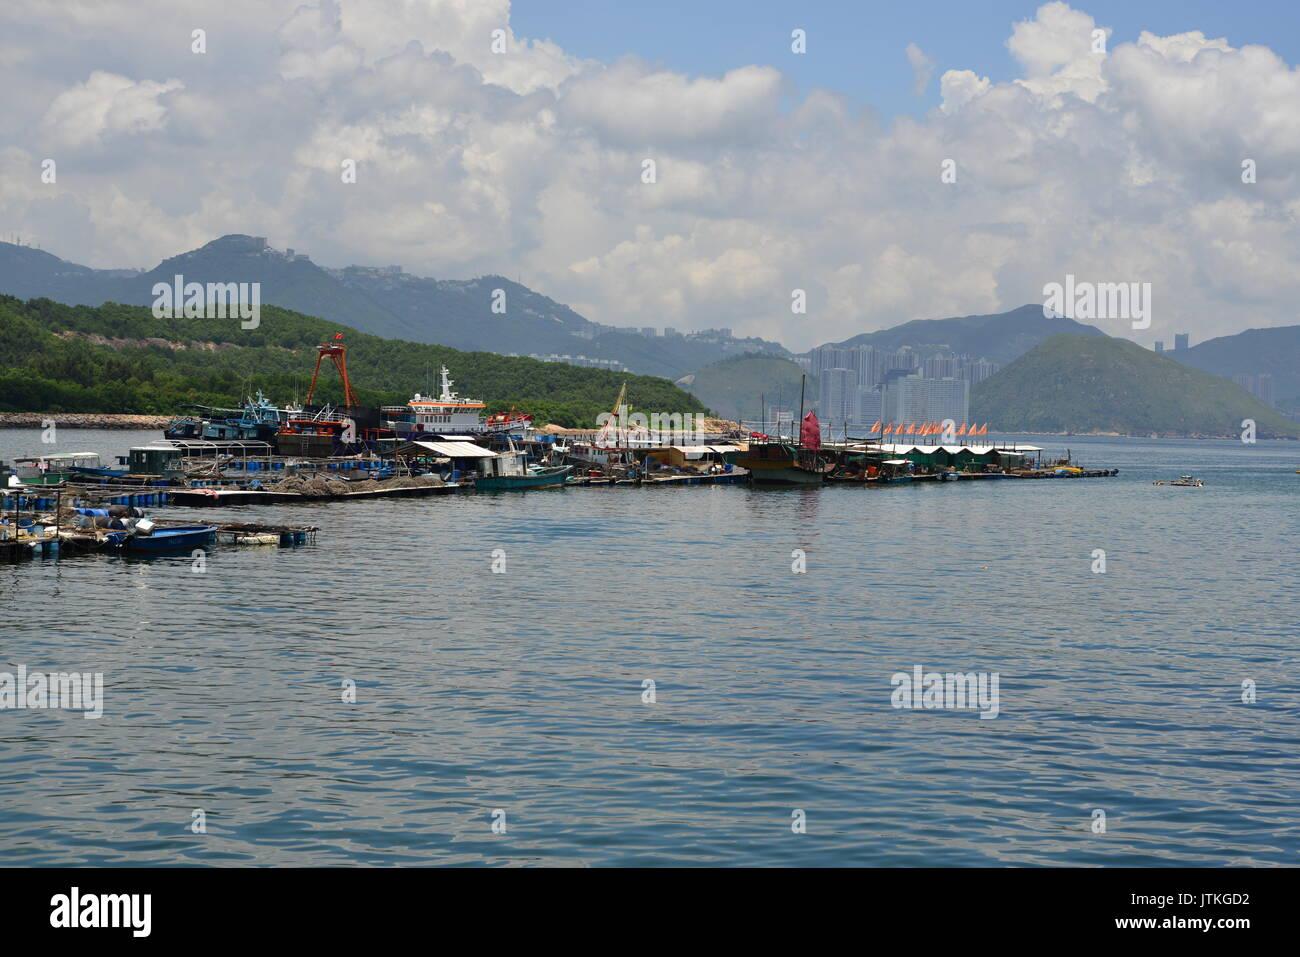 China, Hong Kong, Lamma Island, Sok Kwu Wan - Stock Image